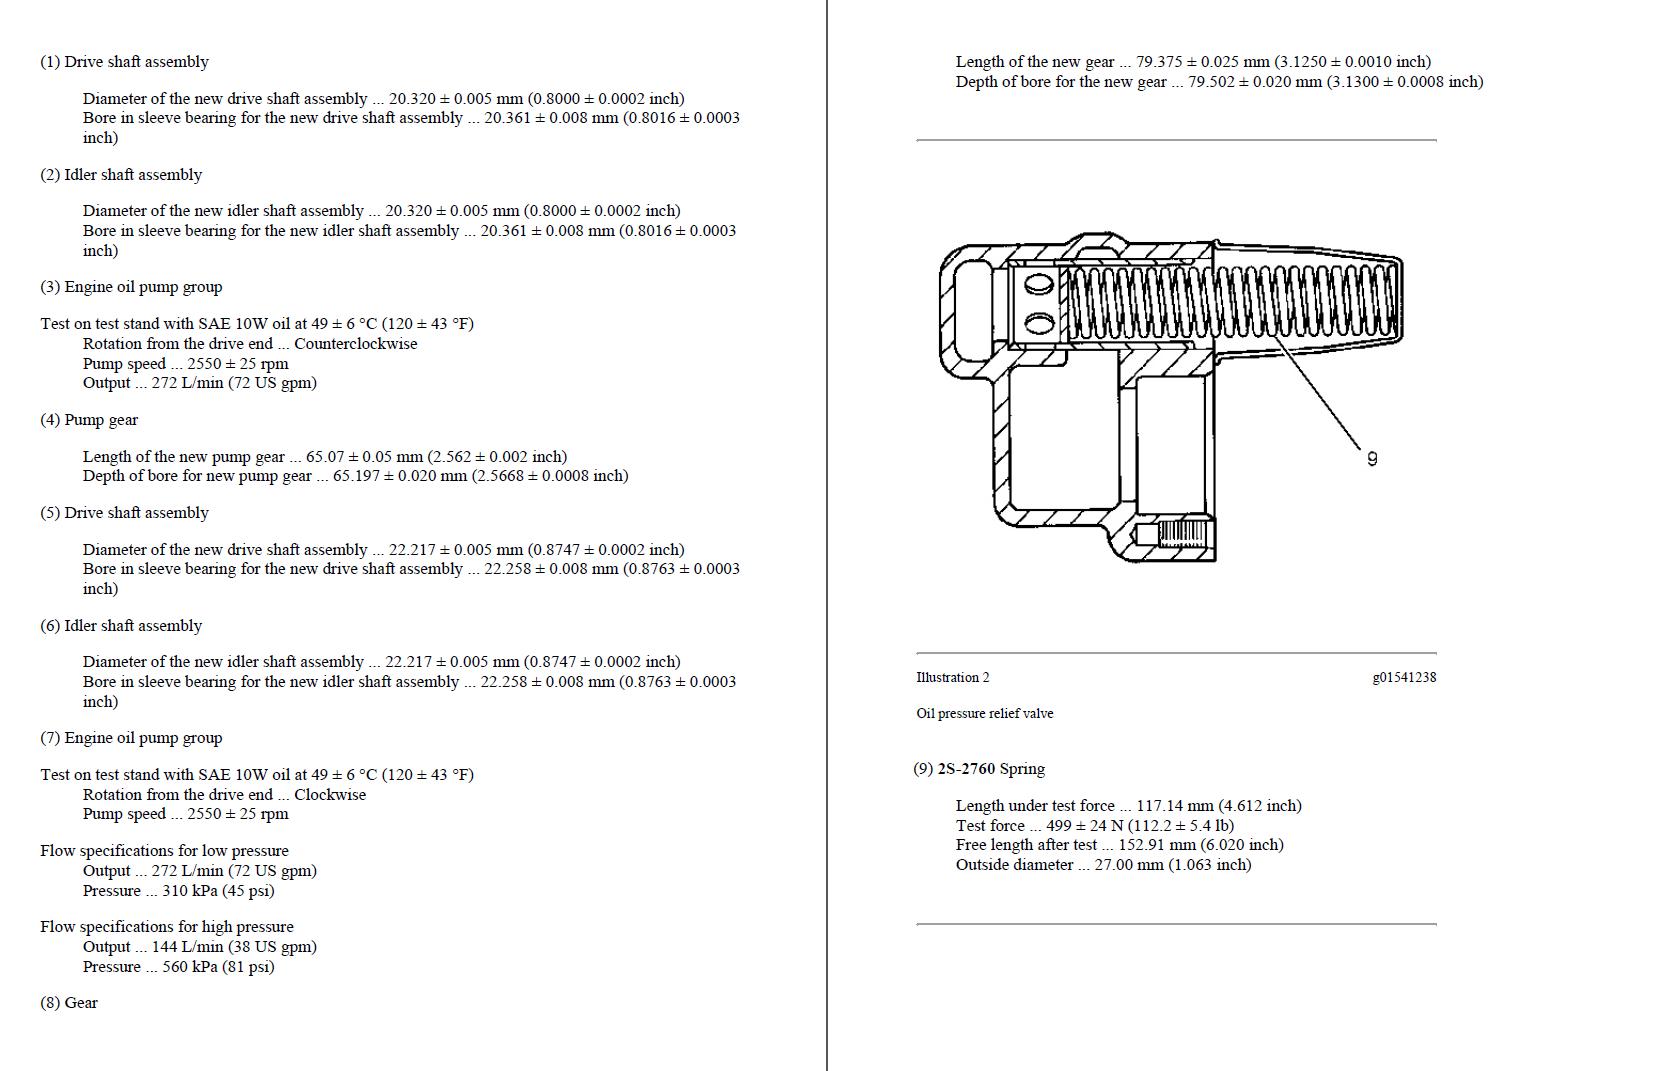 Cat Mxs Ecm Wiring Diagram 3406e Caterpillar C15 Truck Engine Complete Shop Service Manual